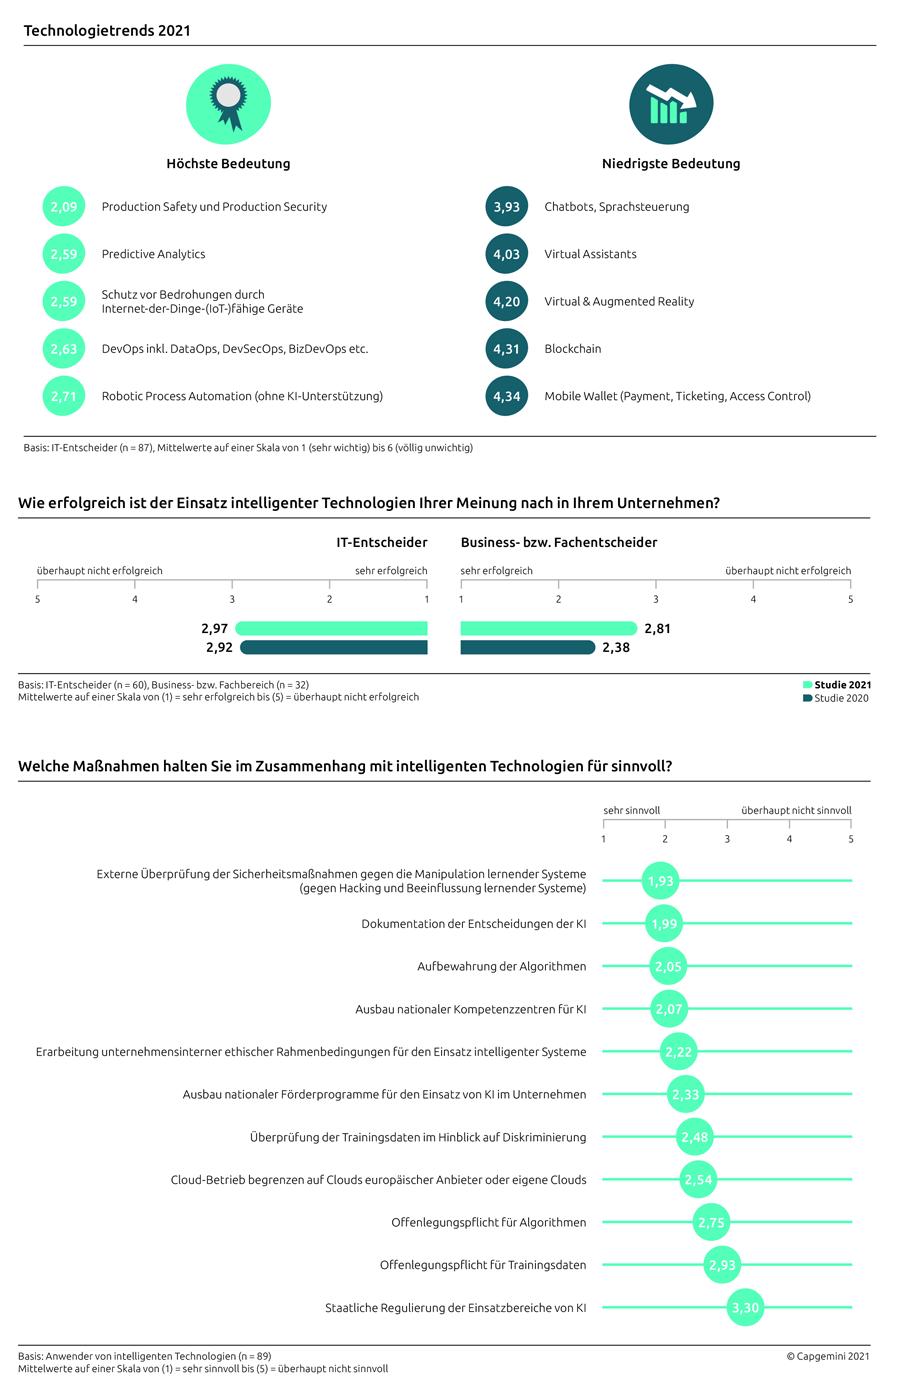 Infografik: Wichtige IT-Trends des Jahres 2021